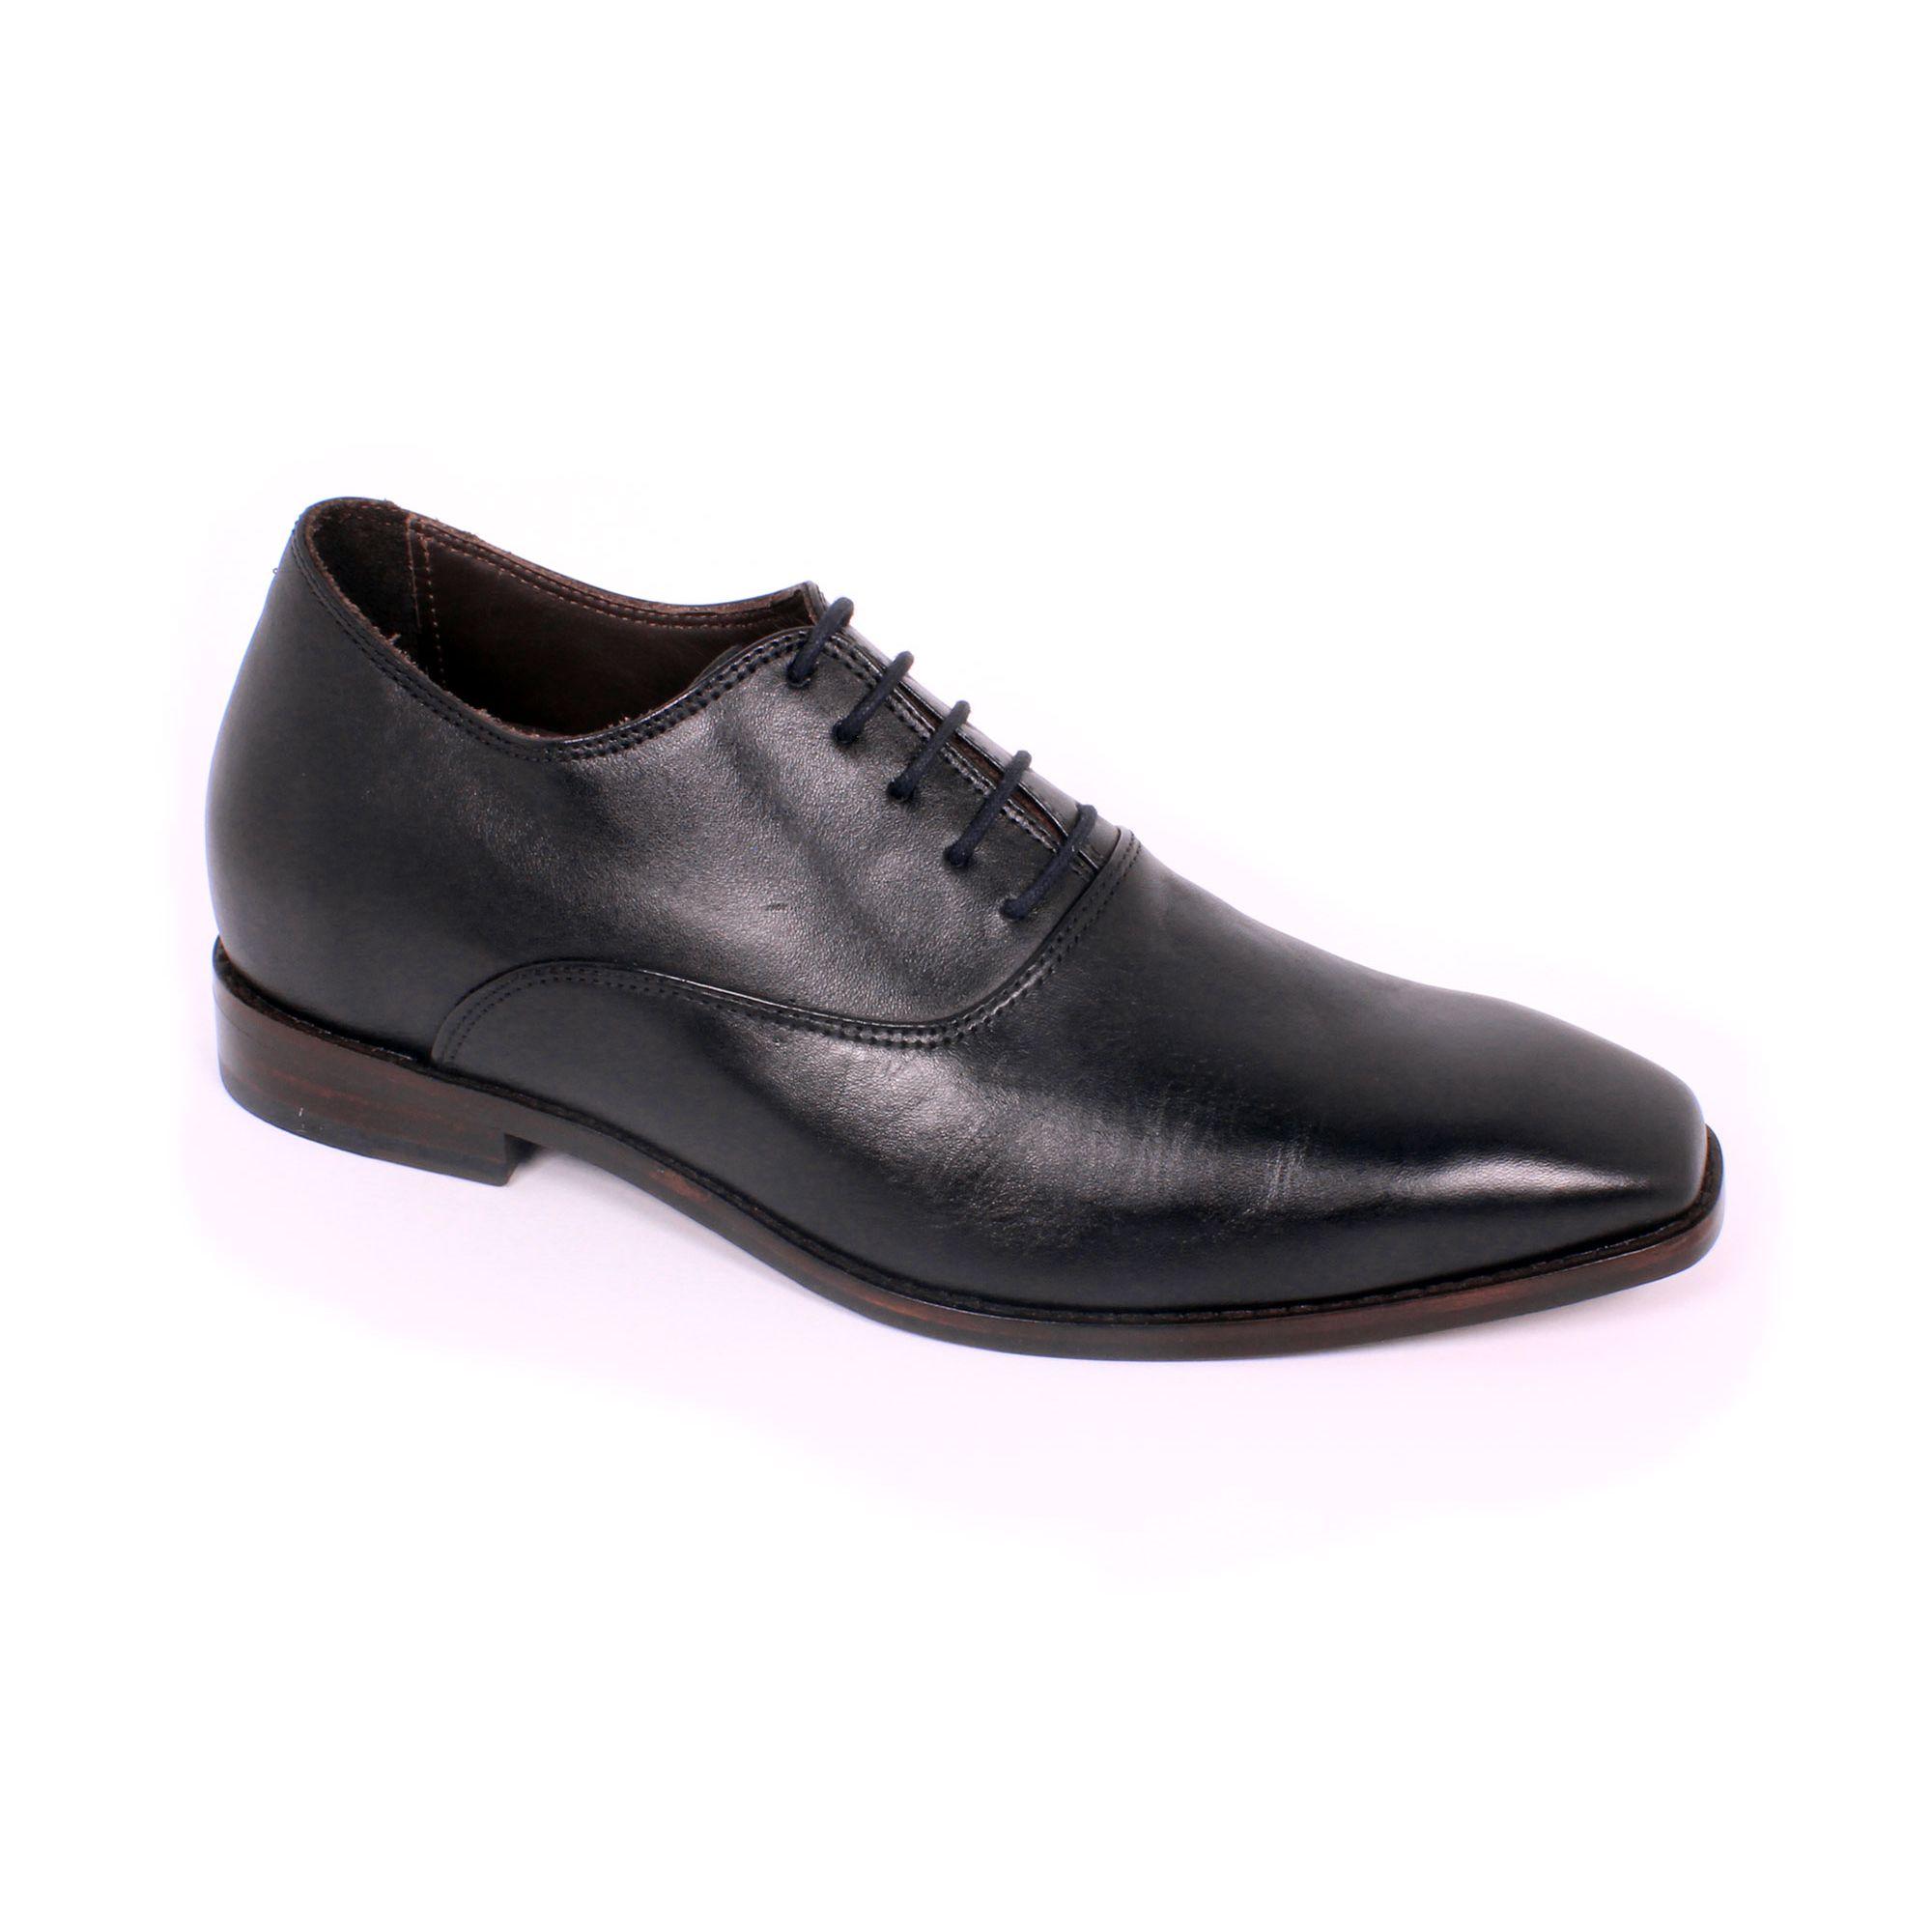 Zapato Formal Elegant Negro Max Denegri +7cm de Altura_70797